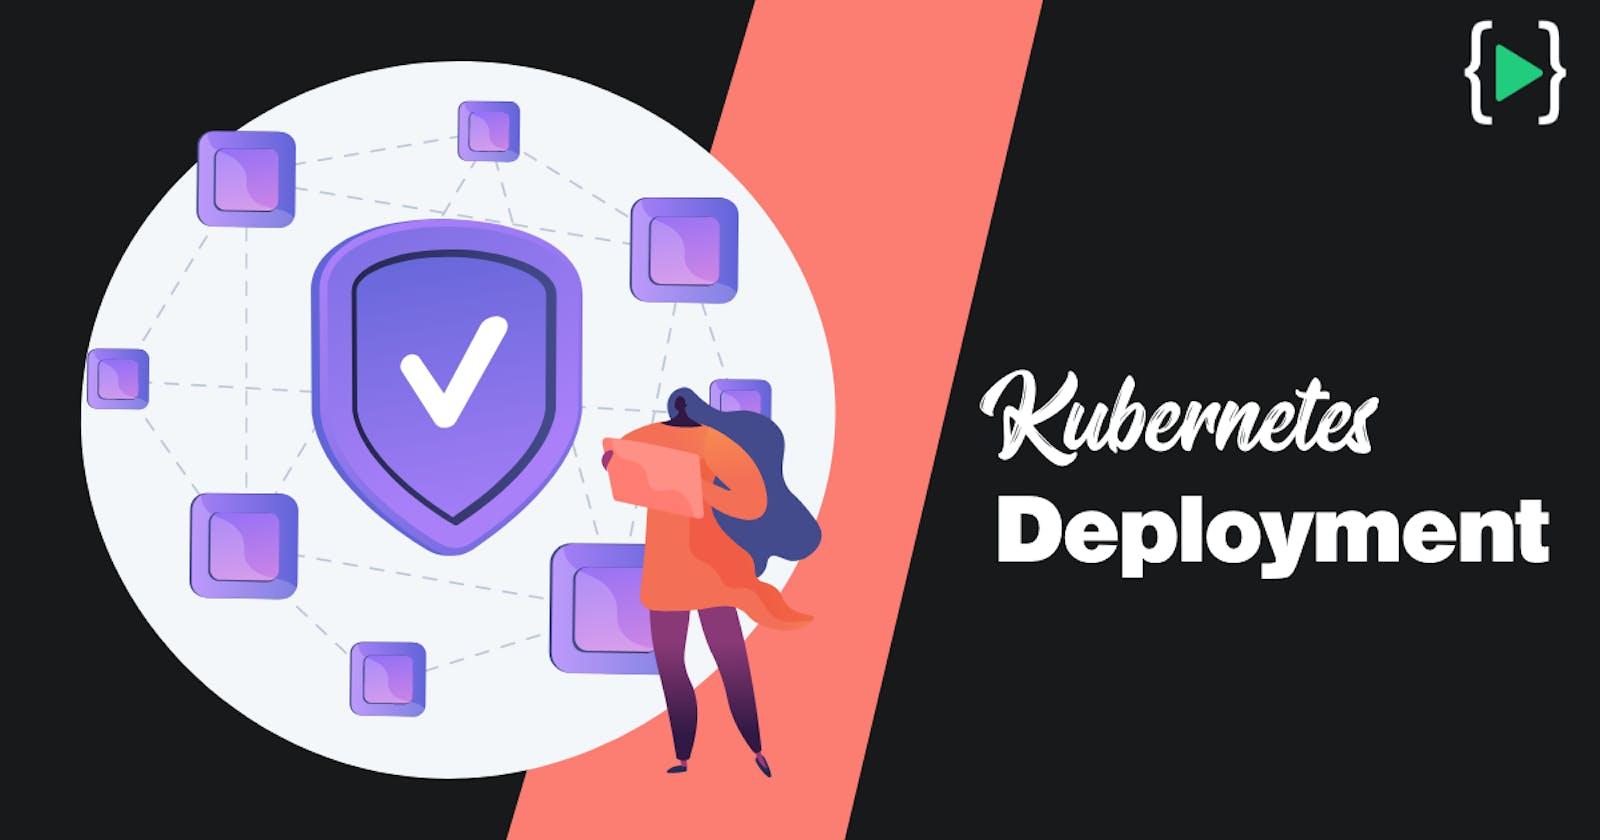 Kubernetes Core Concepts - Deployments